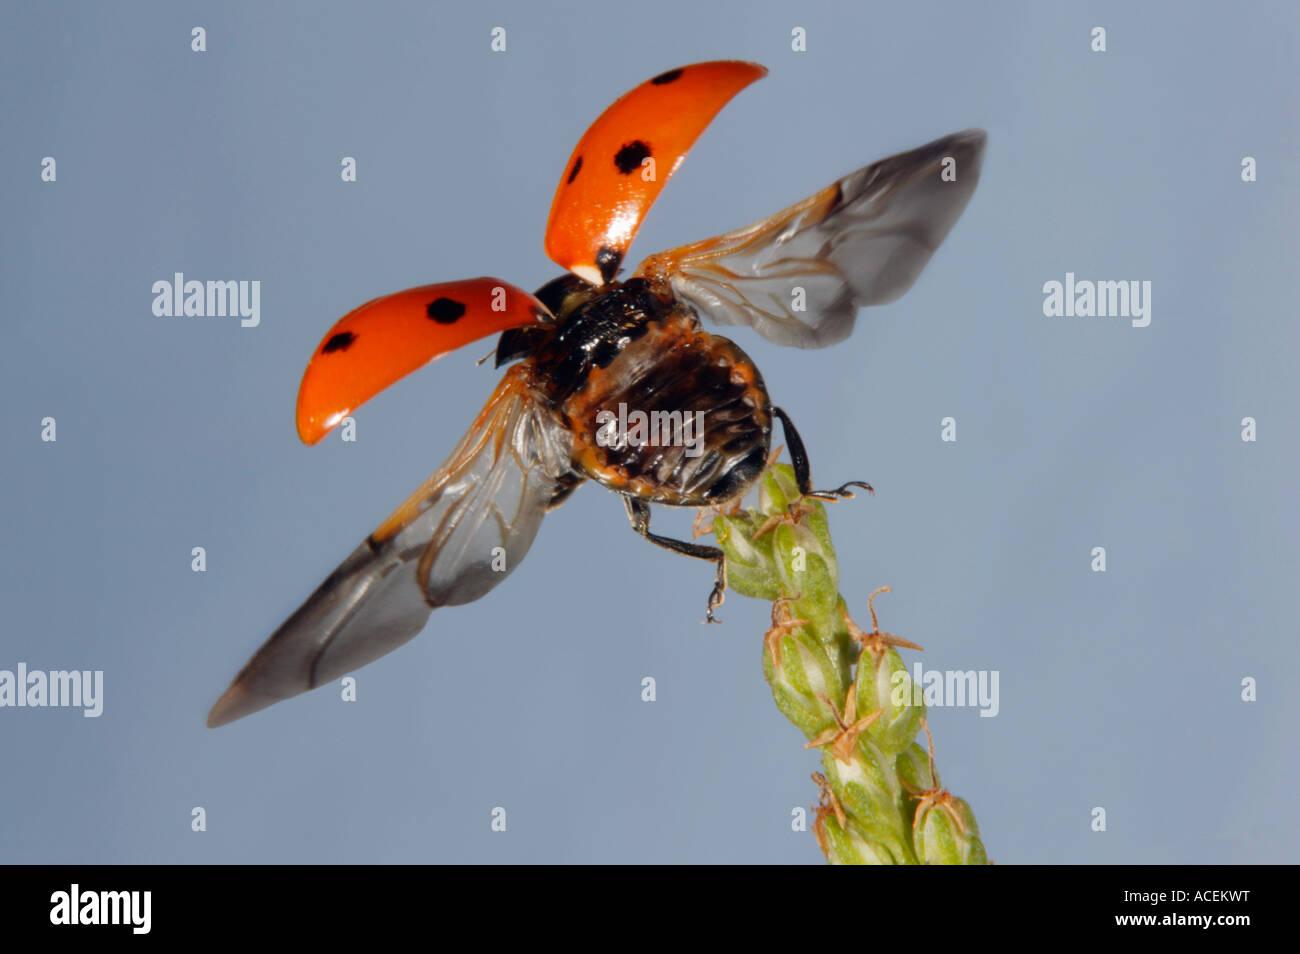 Sevenspotted lady beetle Coccinella septempunctata - Stock Image